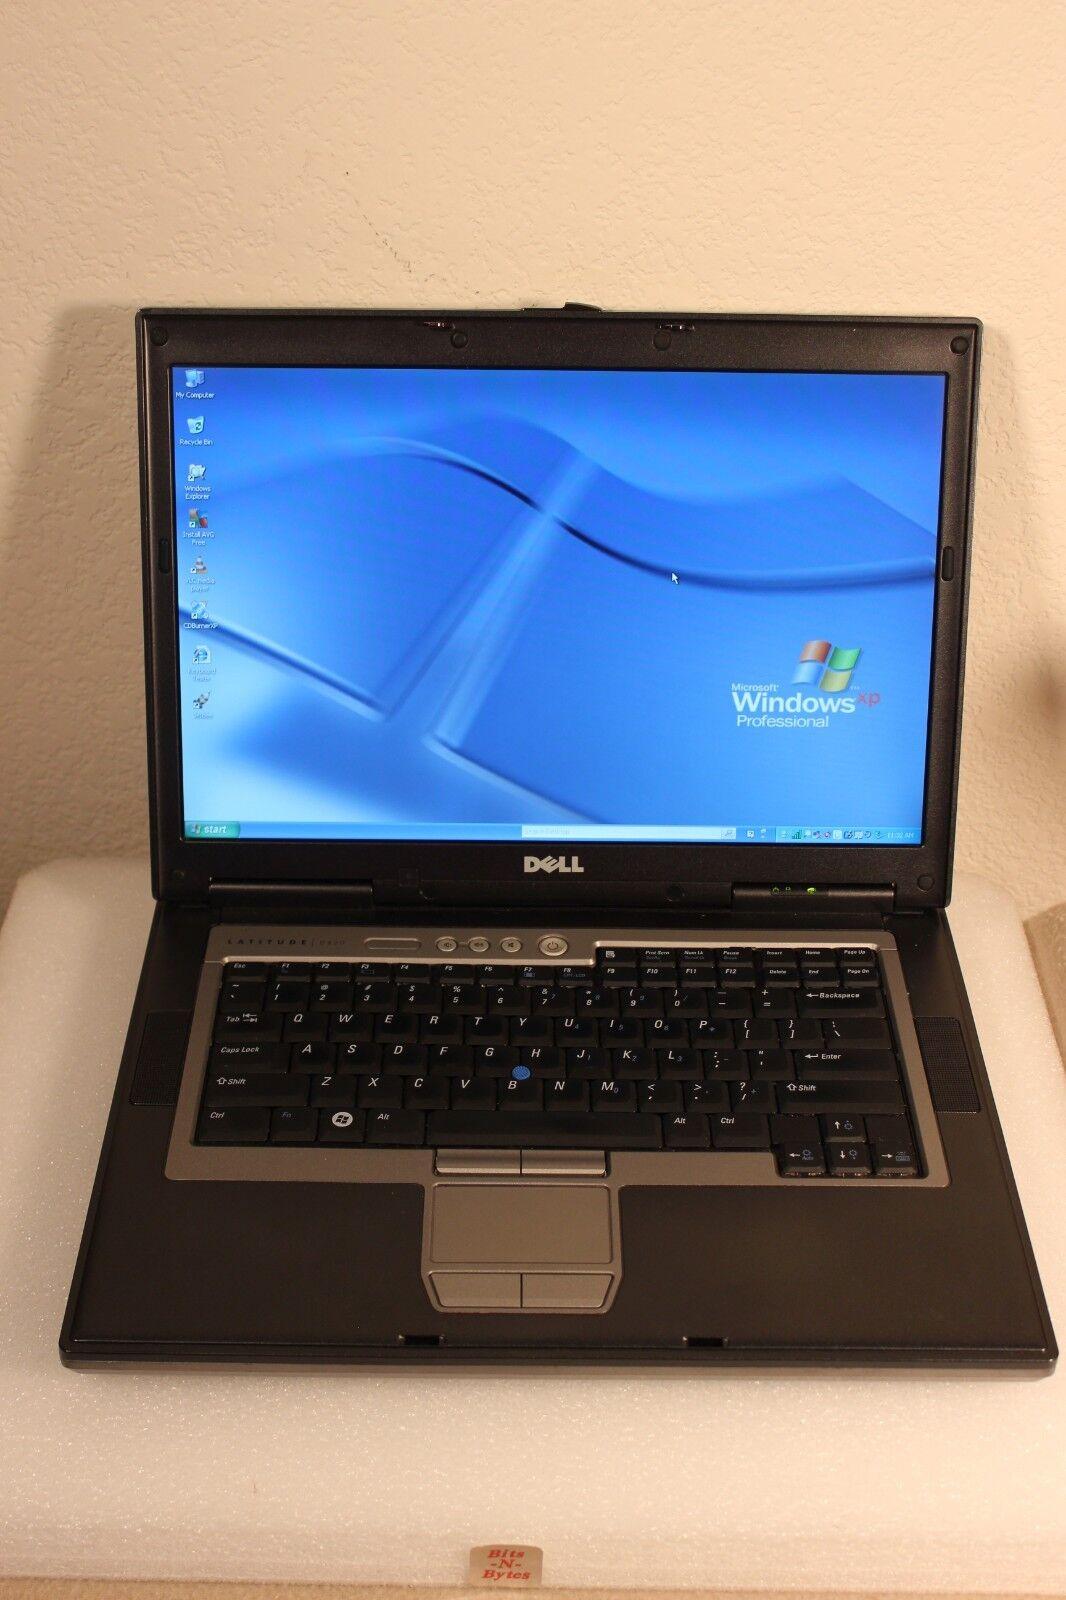 Dell Latitude D820 Notebook (1.66GHz/1.0GB/80GB/CDRW-DVD) Windows XP PRO 2VLKYB1